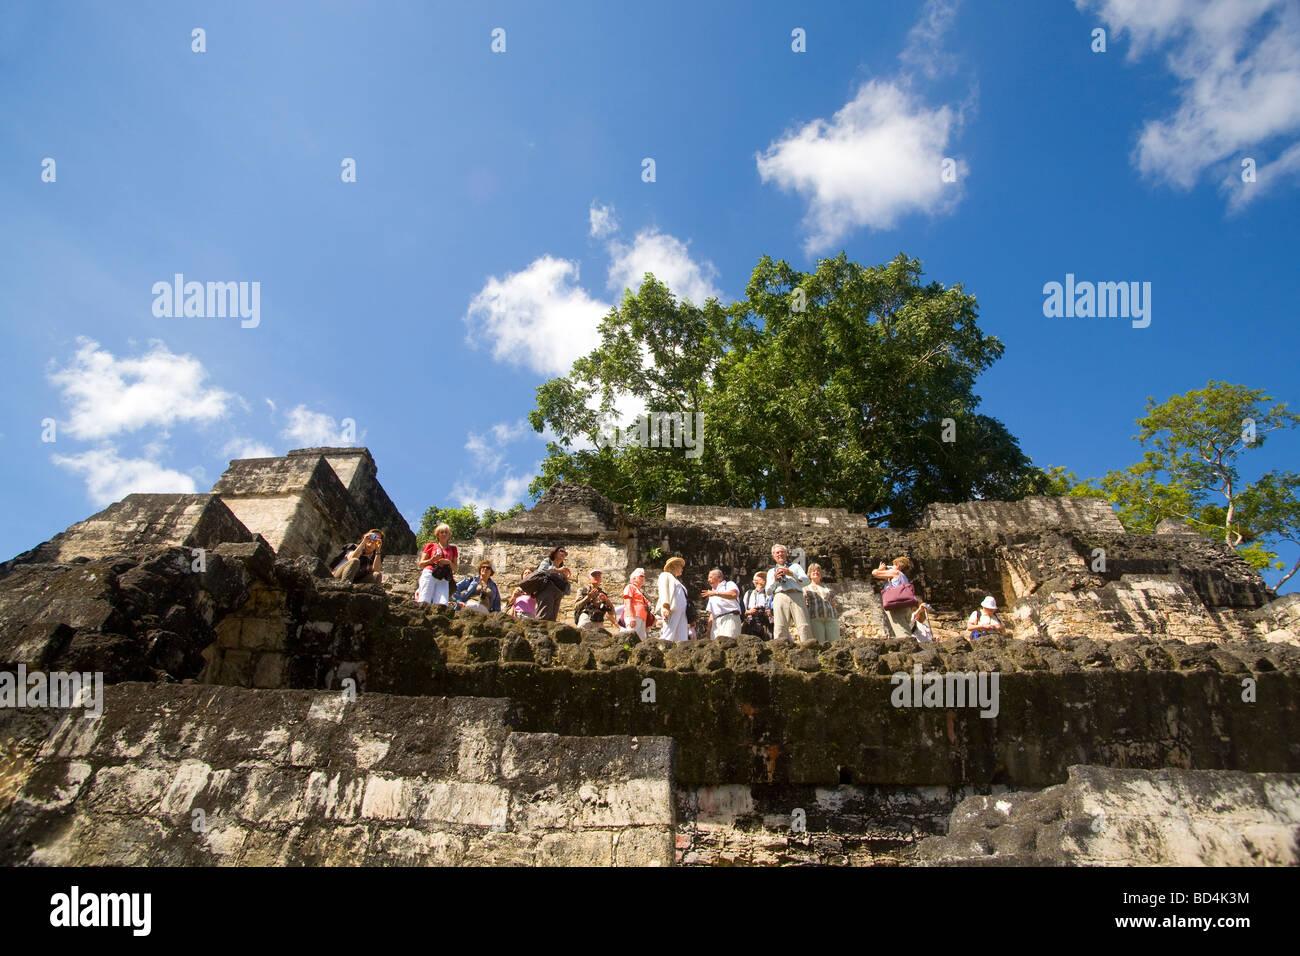 Mayan ruins of Tikal, Guatemala - Stock Image